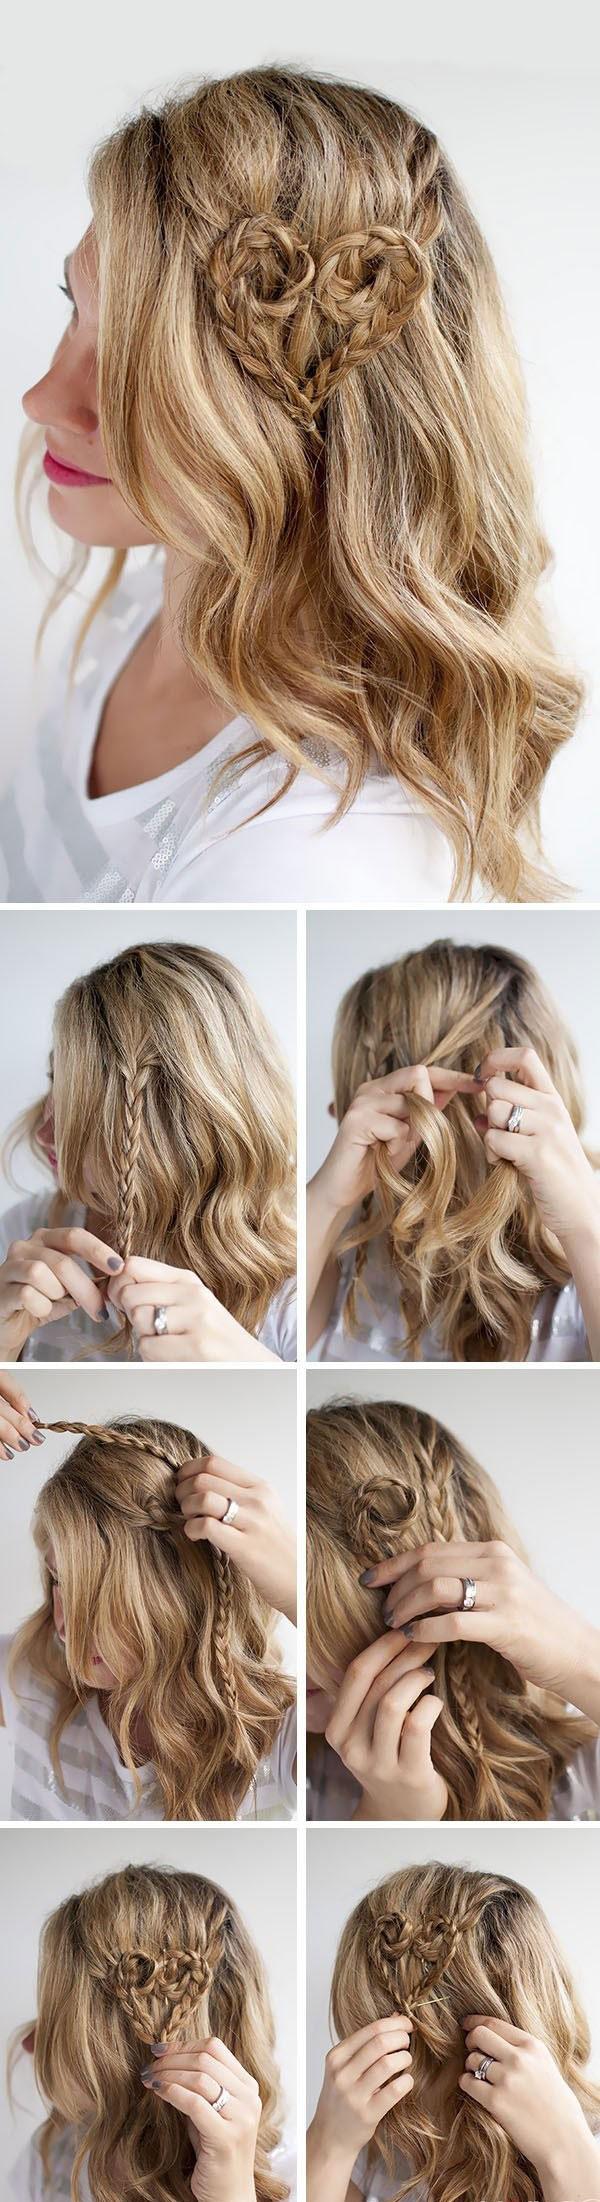 Tutorial peinado sencillo san valentin paso a paso 2